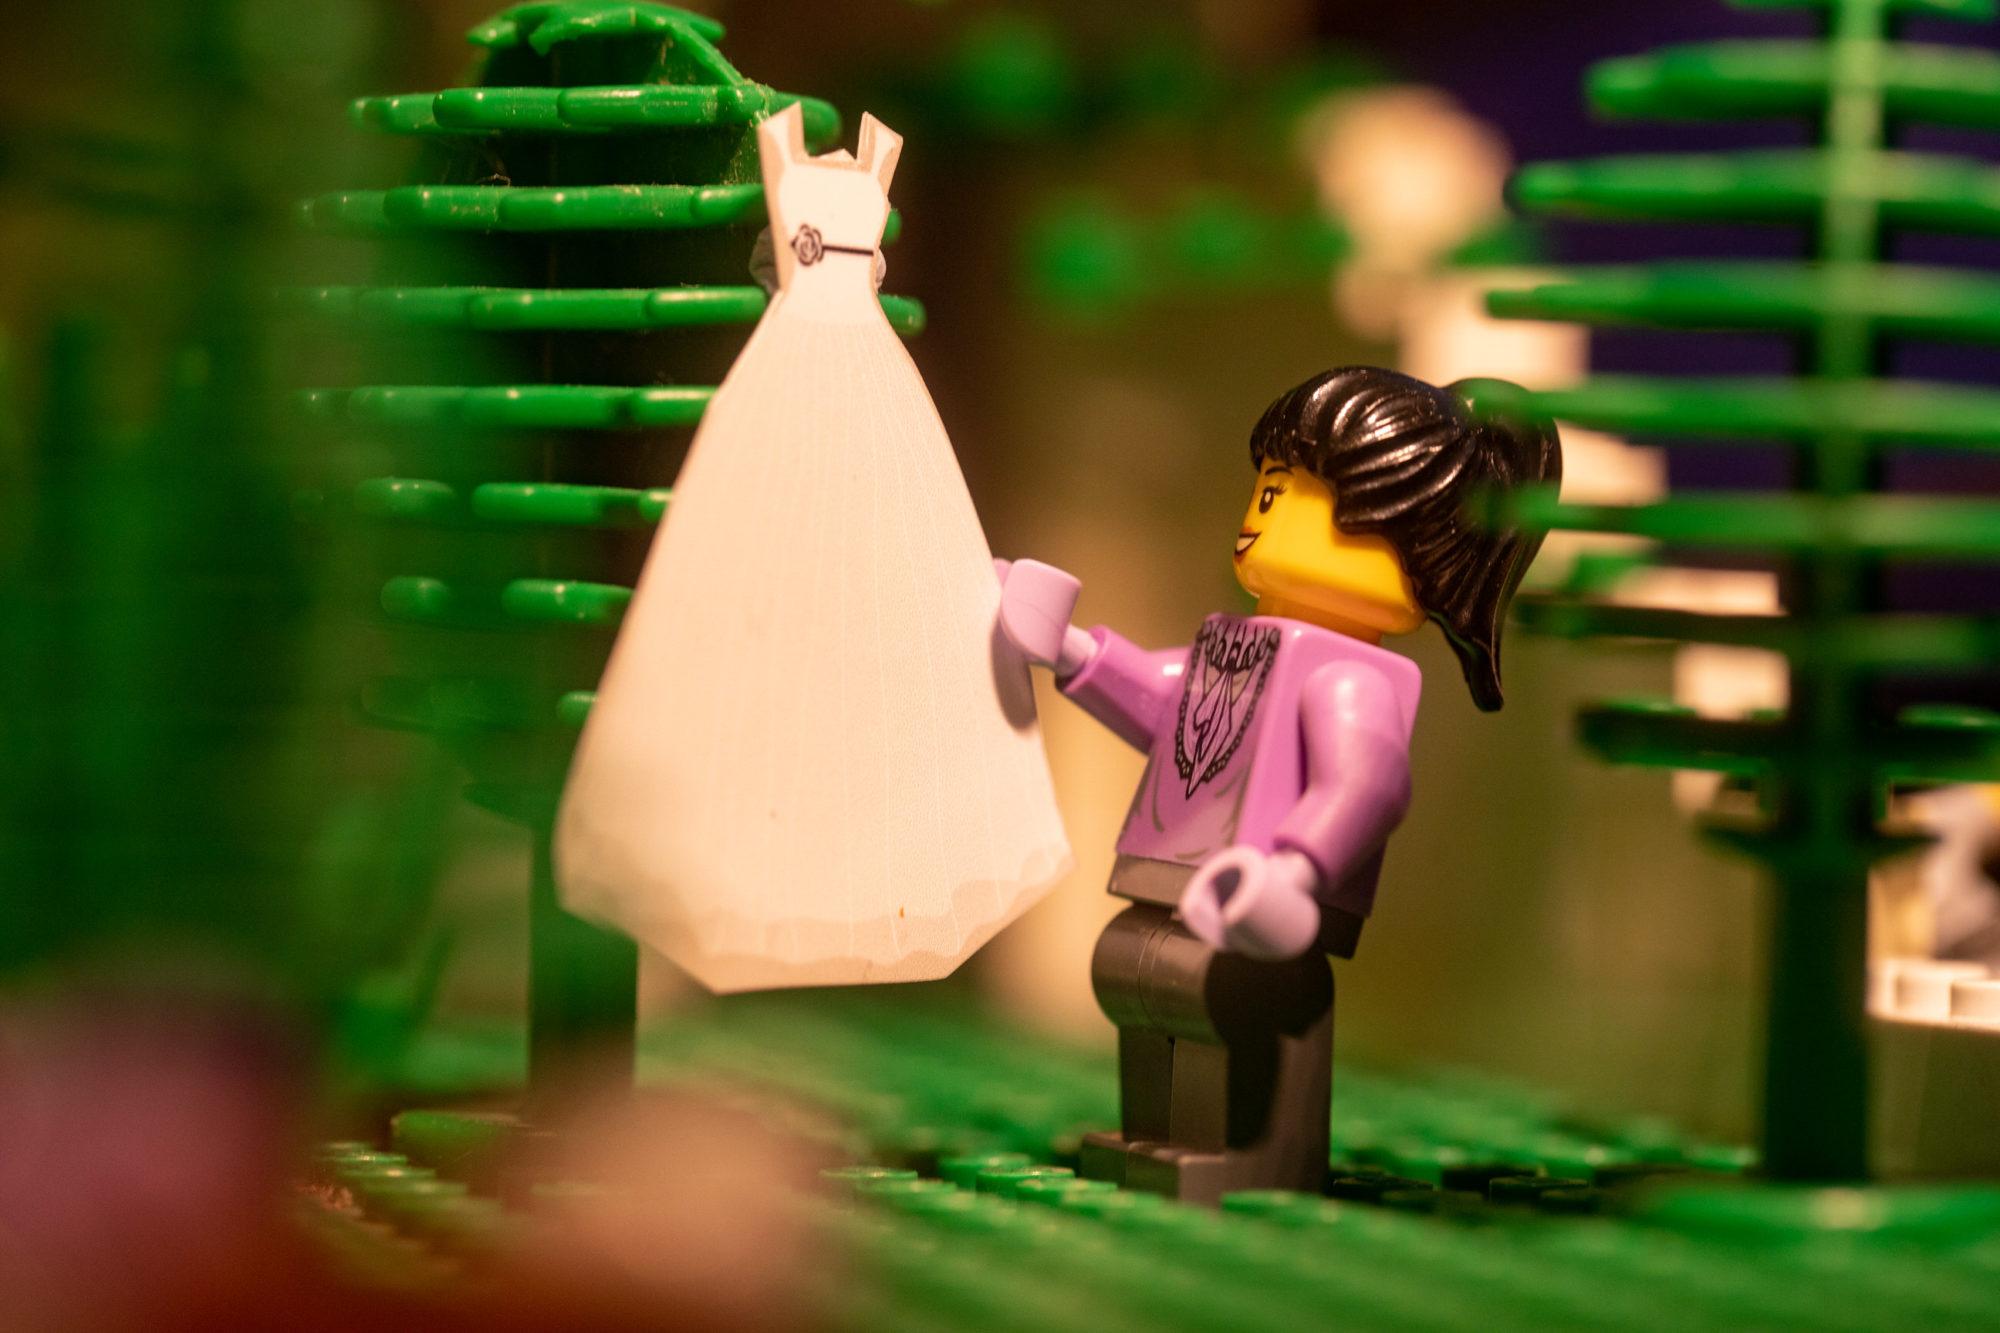 Pictures of a Lego Wedding During the Lockdown – Fubiz Media Design